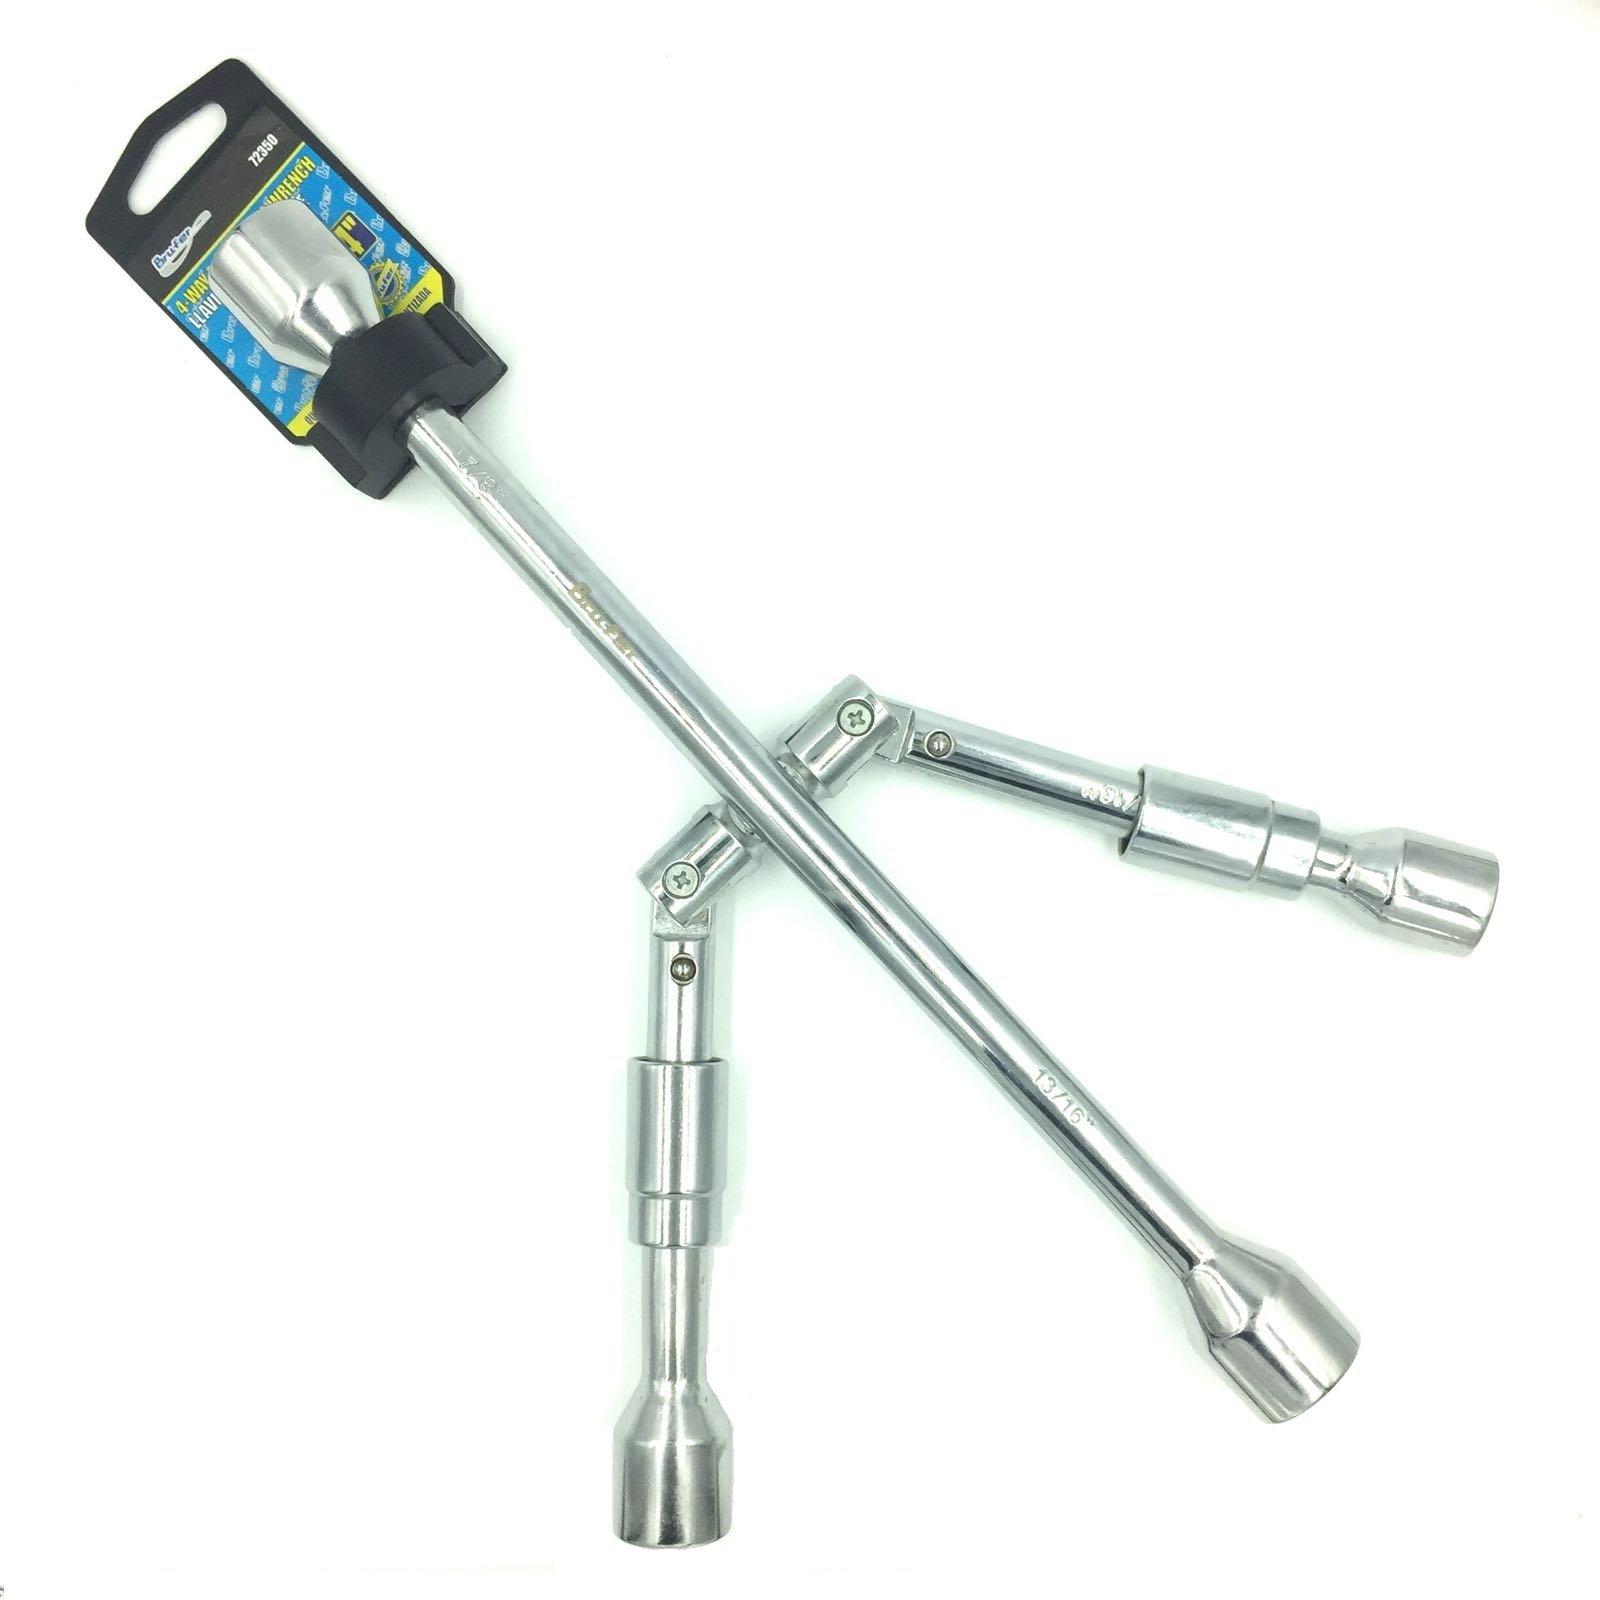 BRUFER 72350 4-Way Folding Lug Wrench 14''